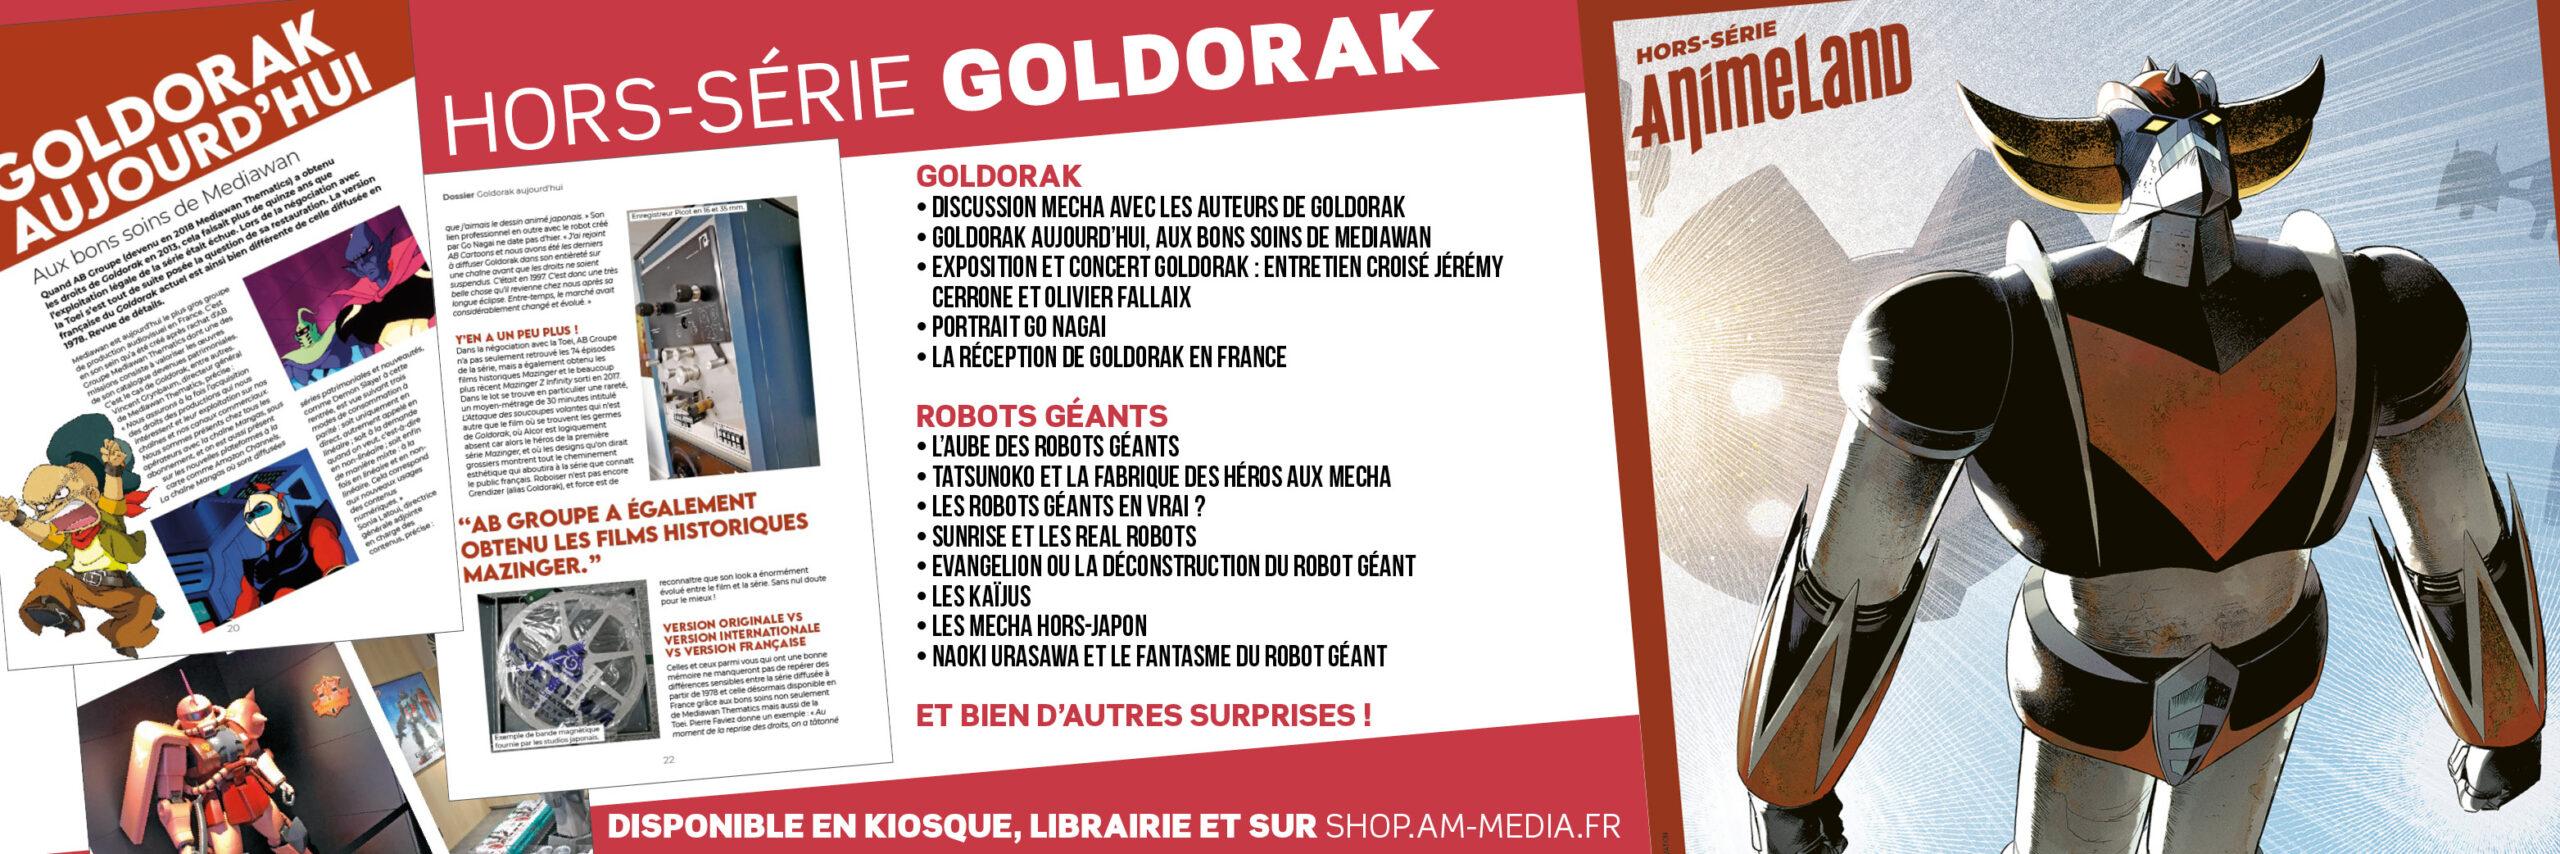 HS Goldorak